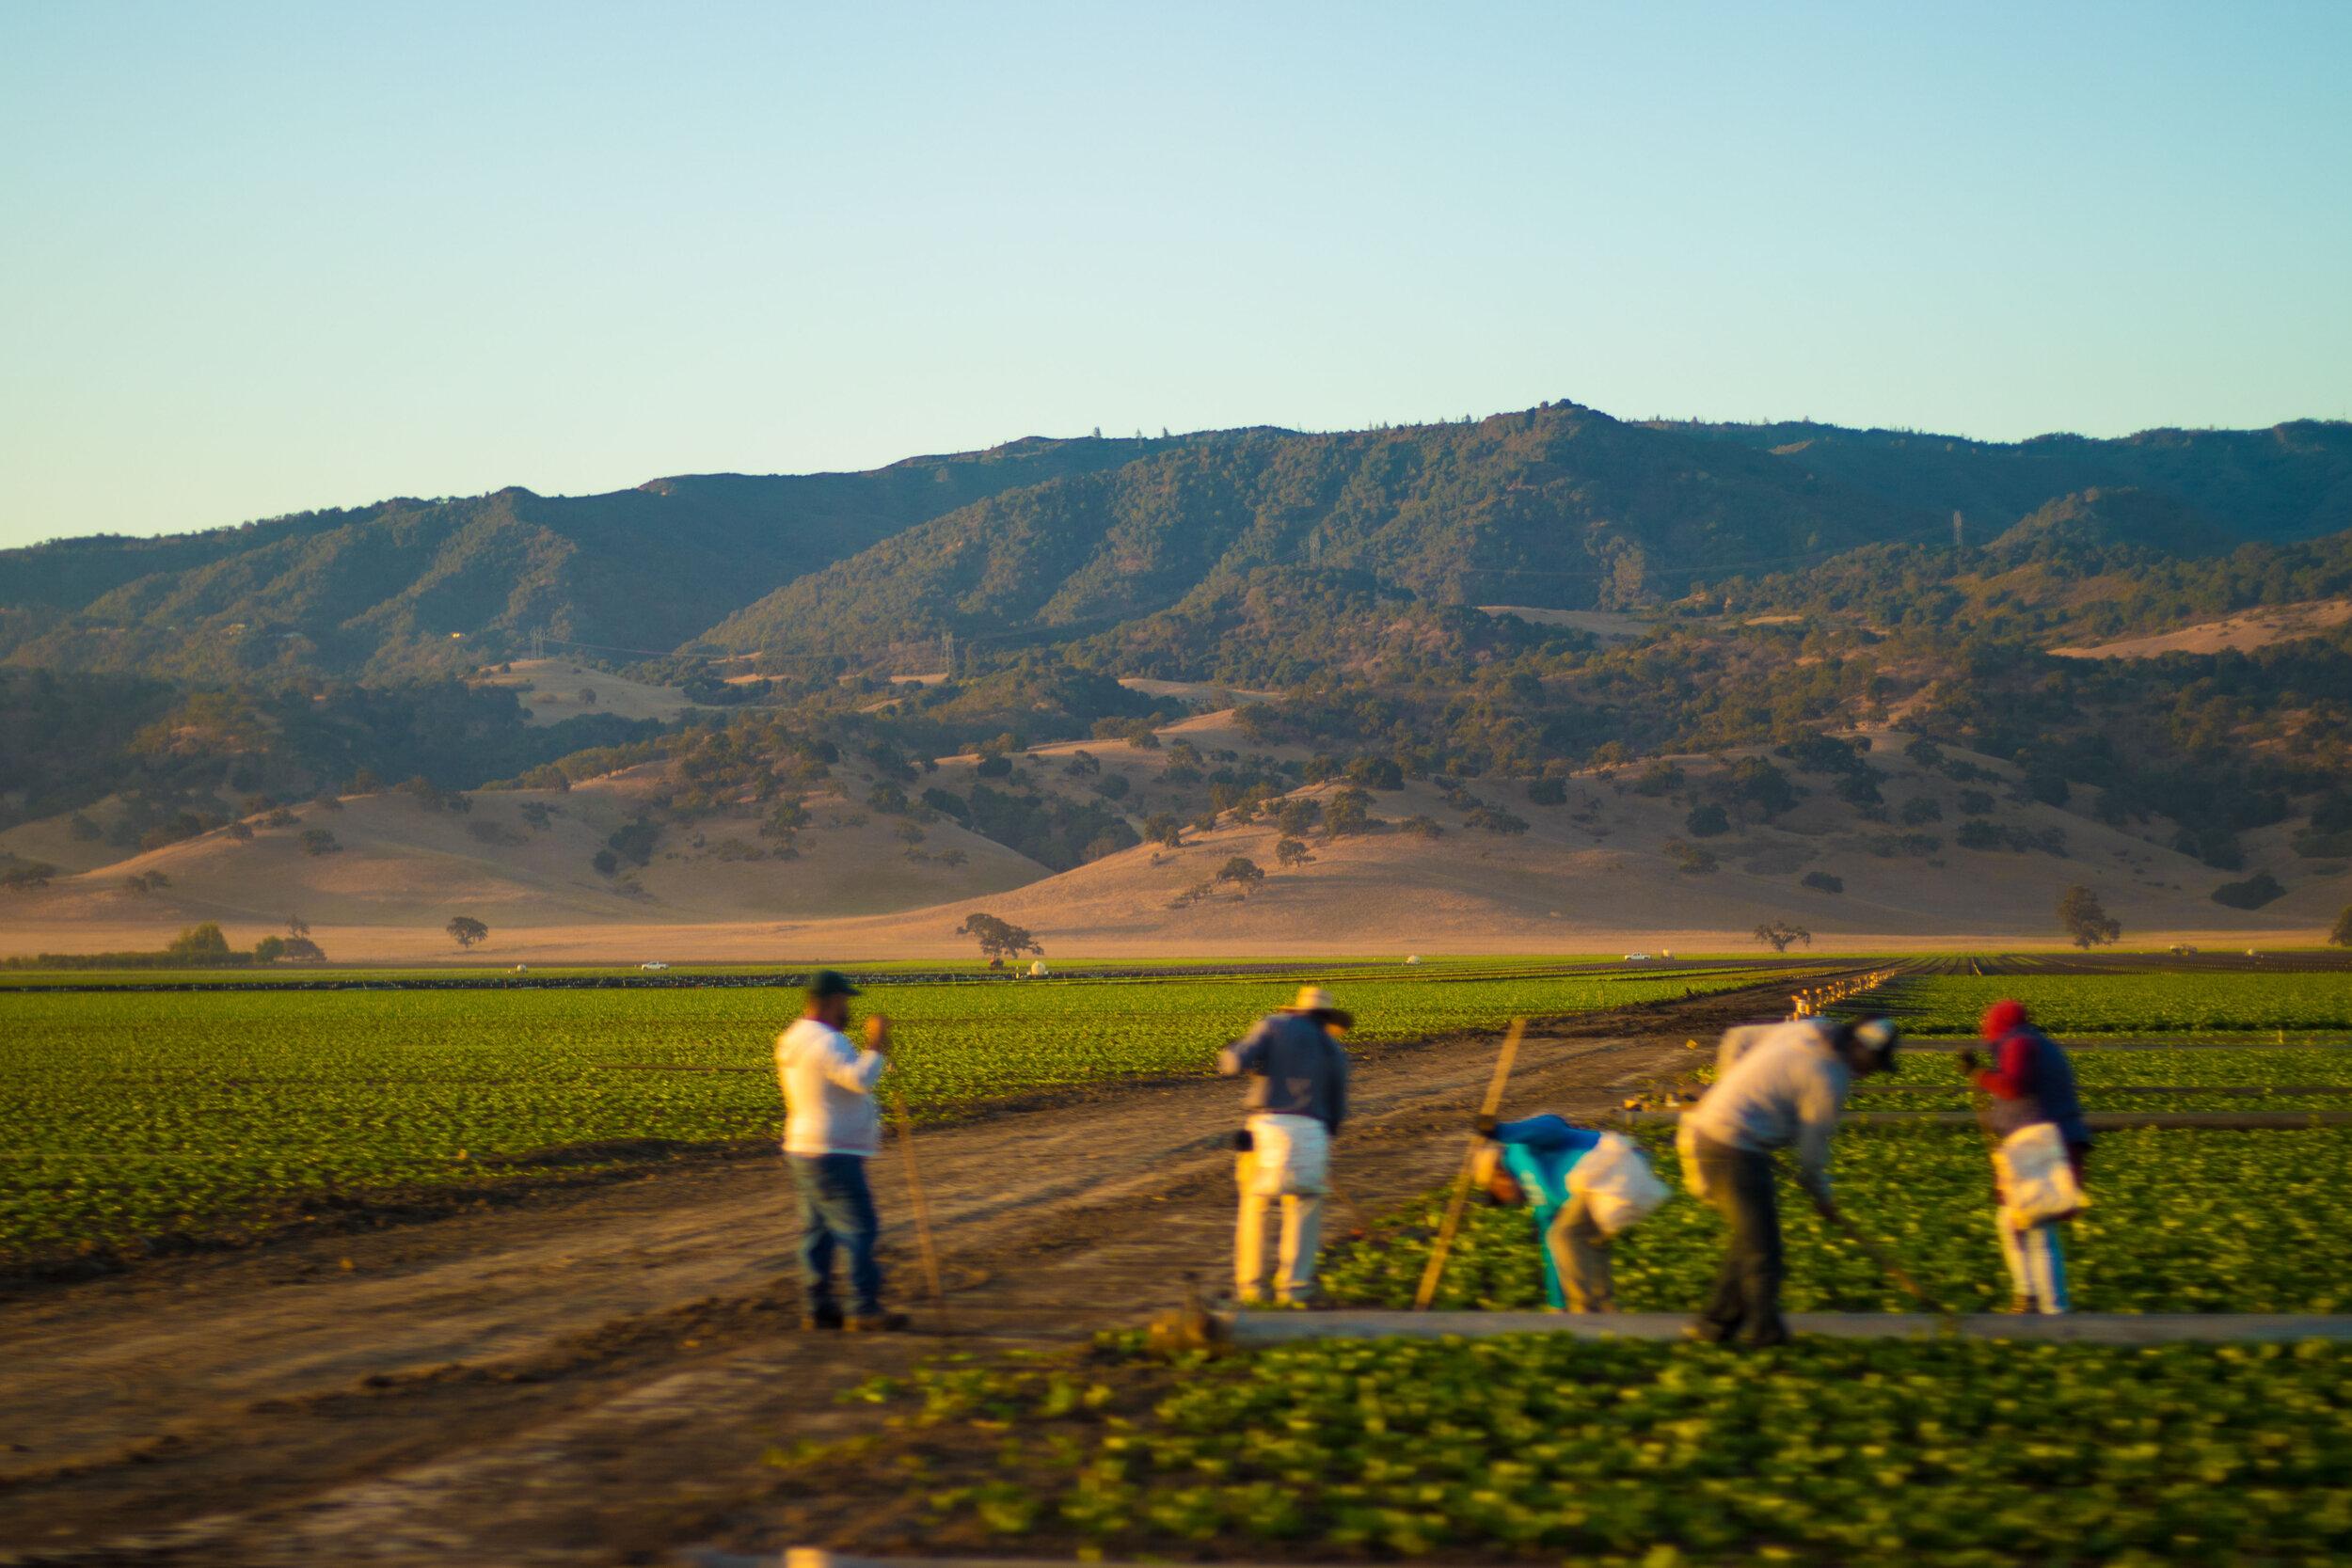 monterey-bay-farmers-california